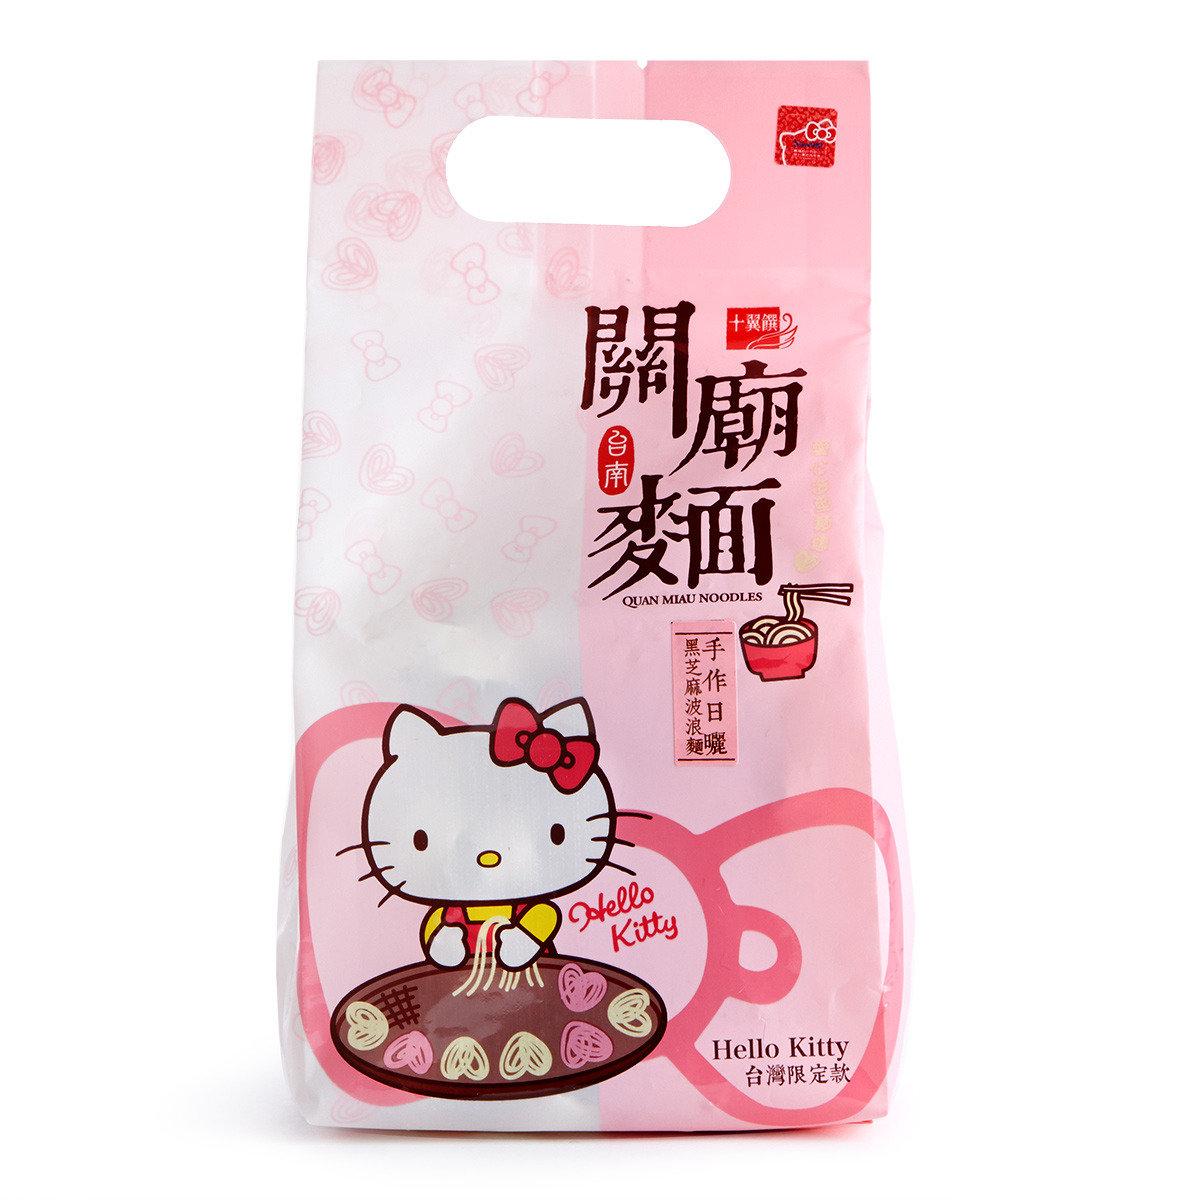 Hello Kitty台南黑芝麻關廟麵 (賞味期限: 2016年11月09日)